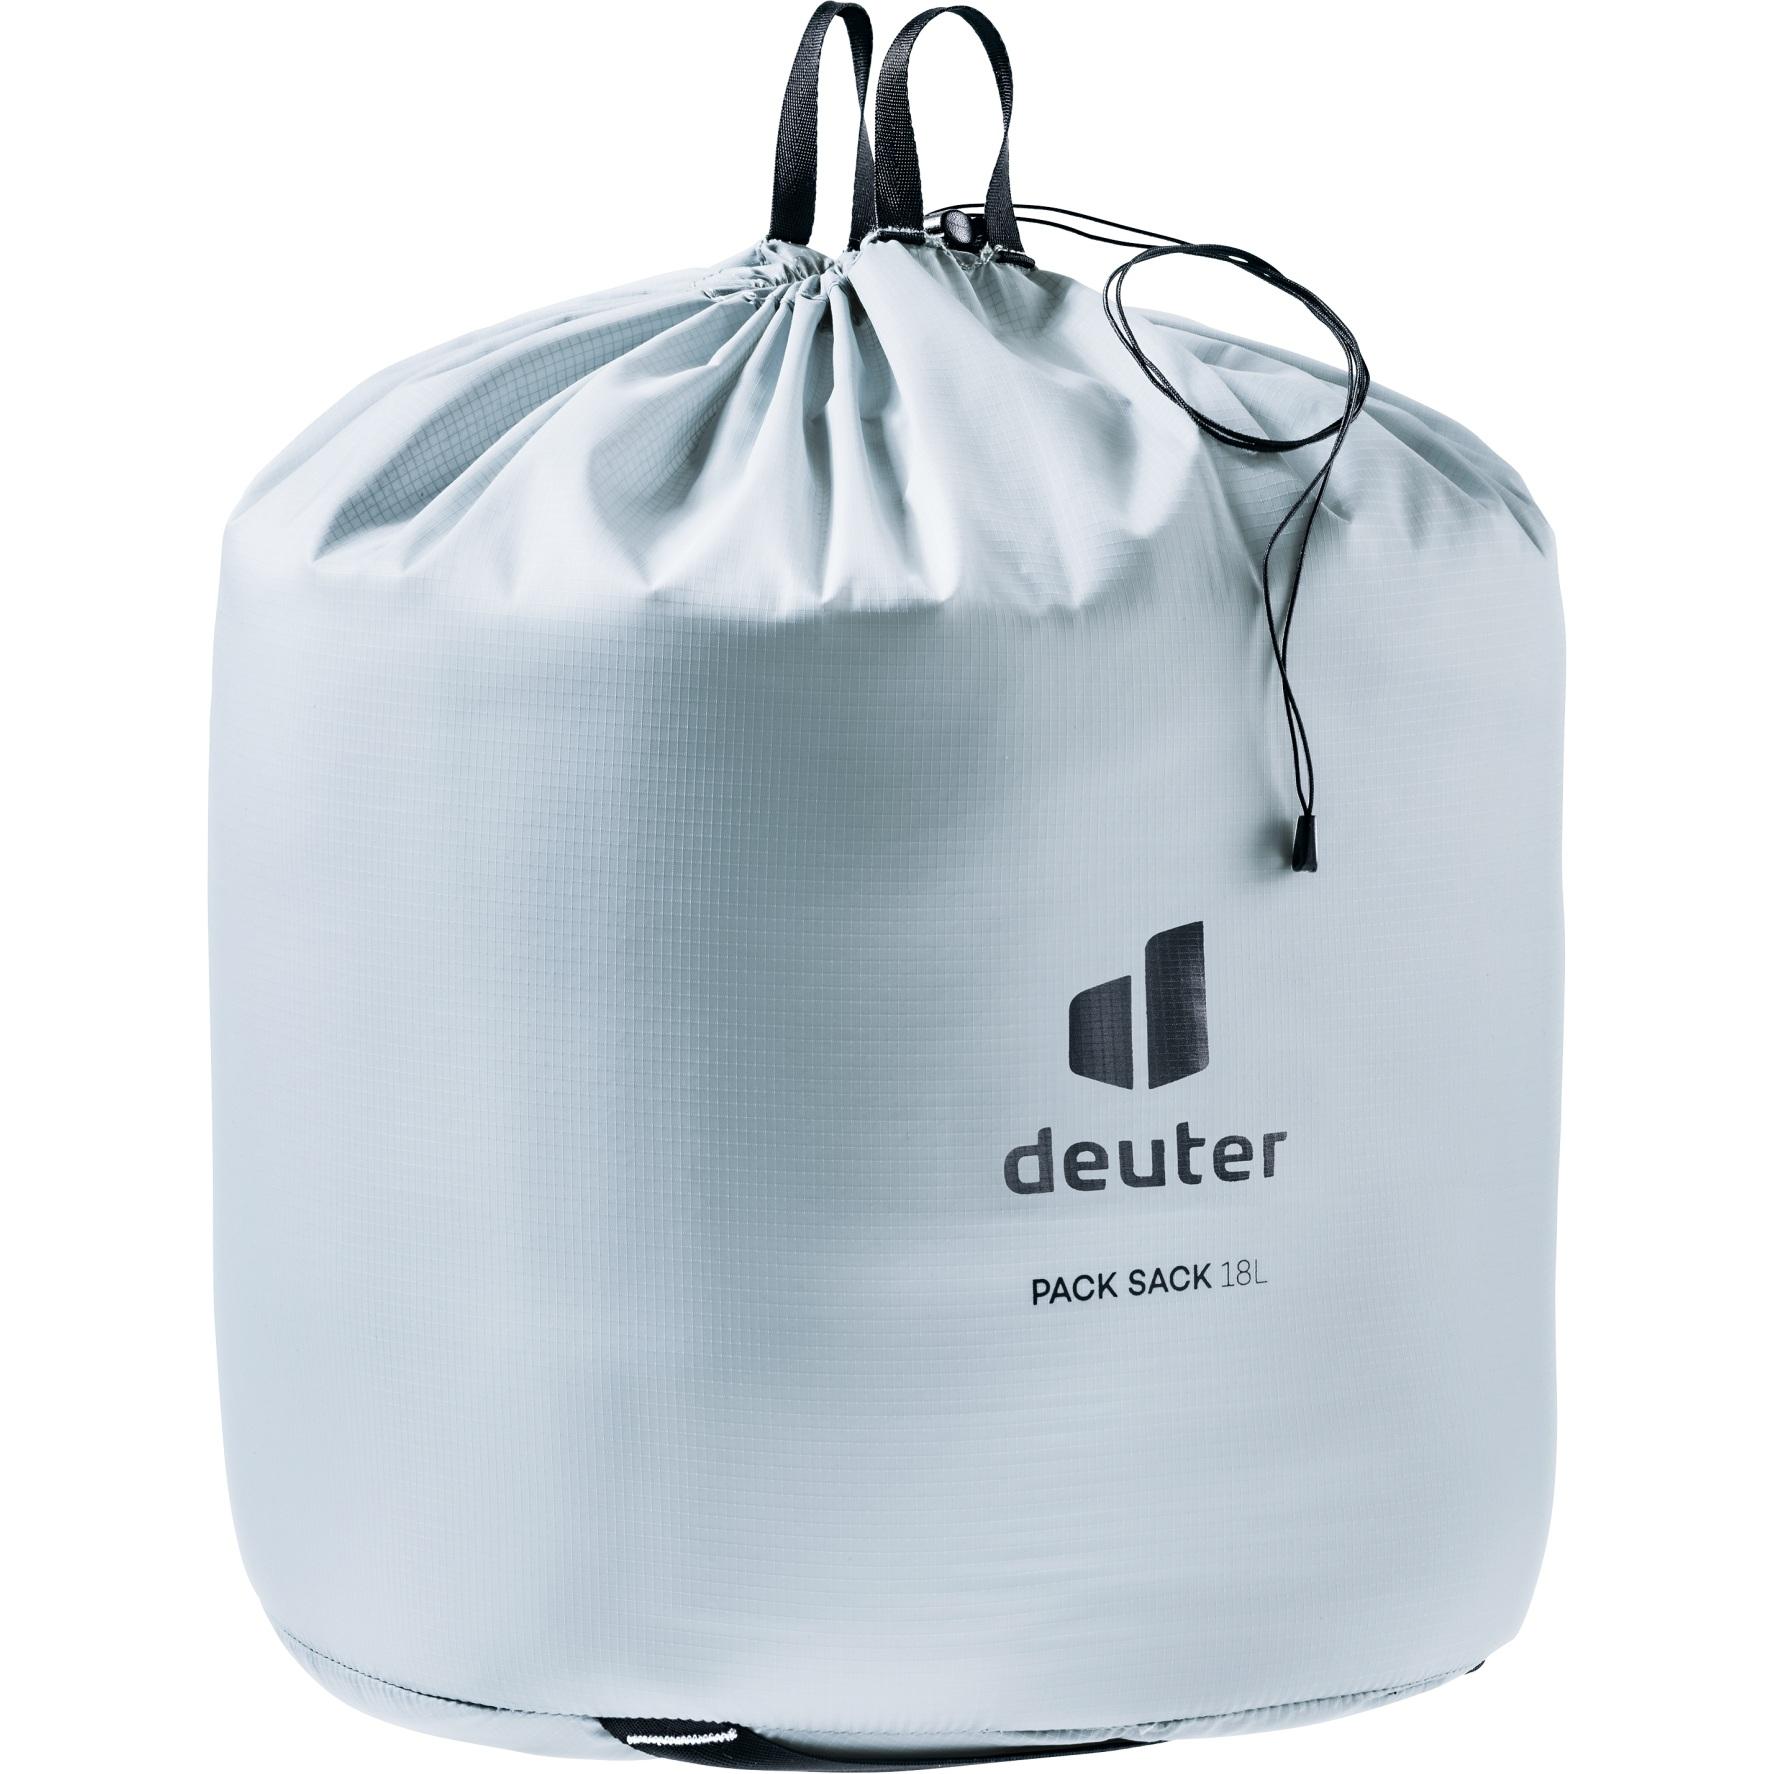 Deuter Pack Sack 18 liters - tin